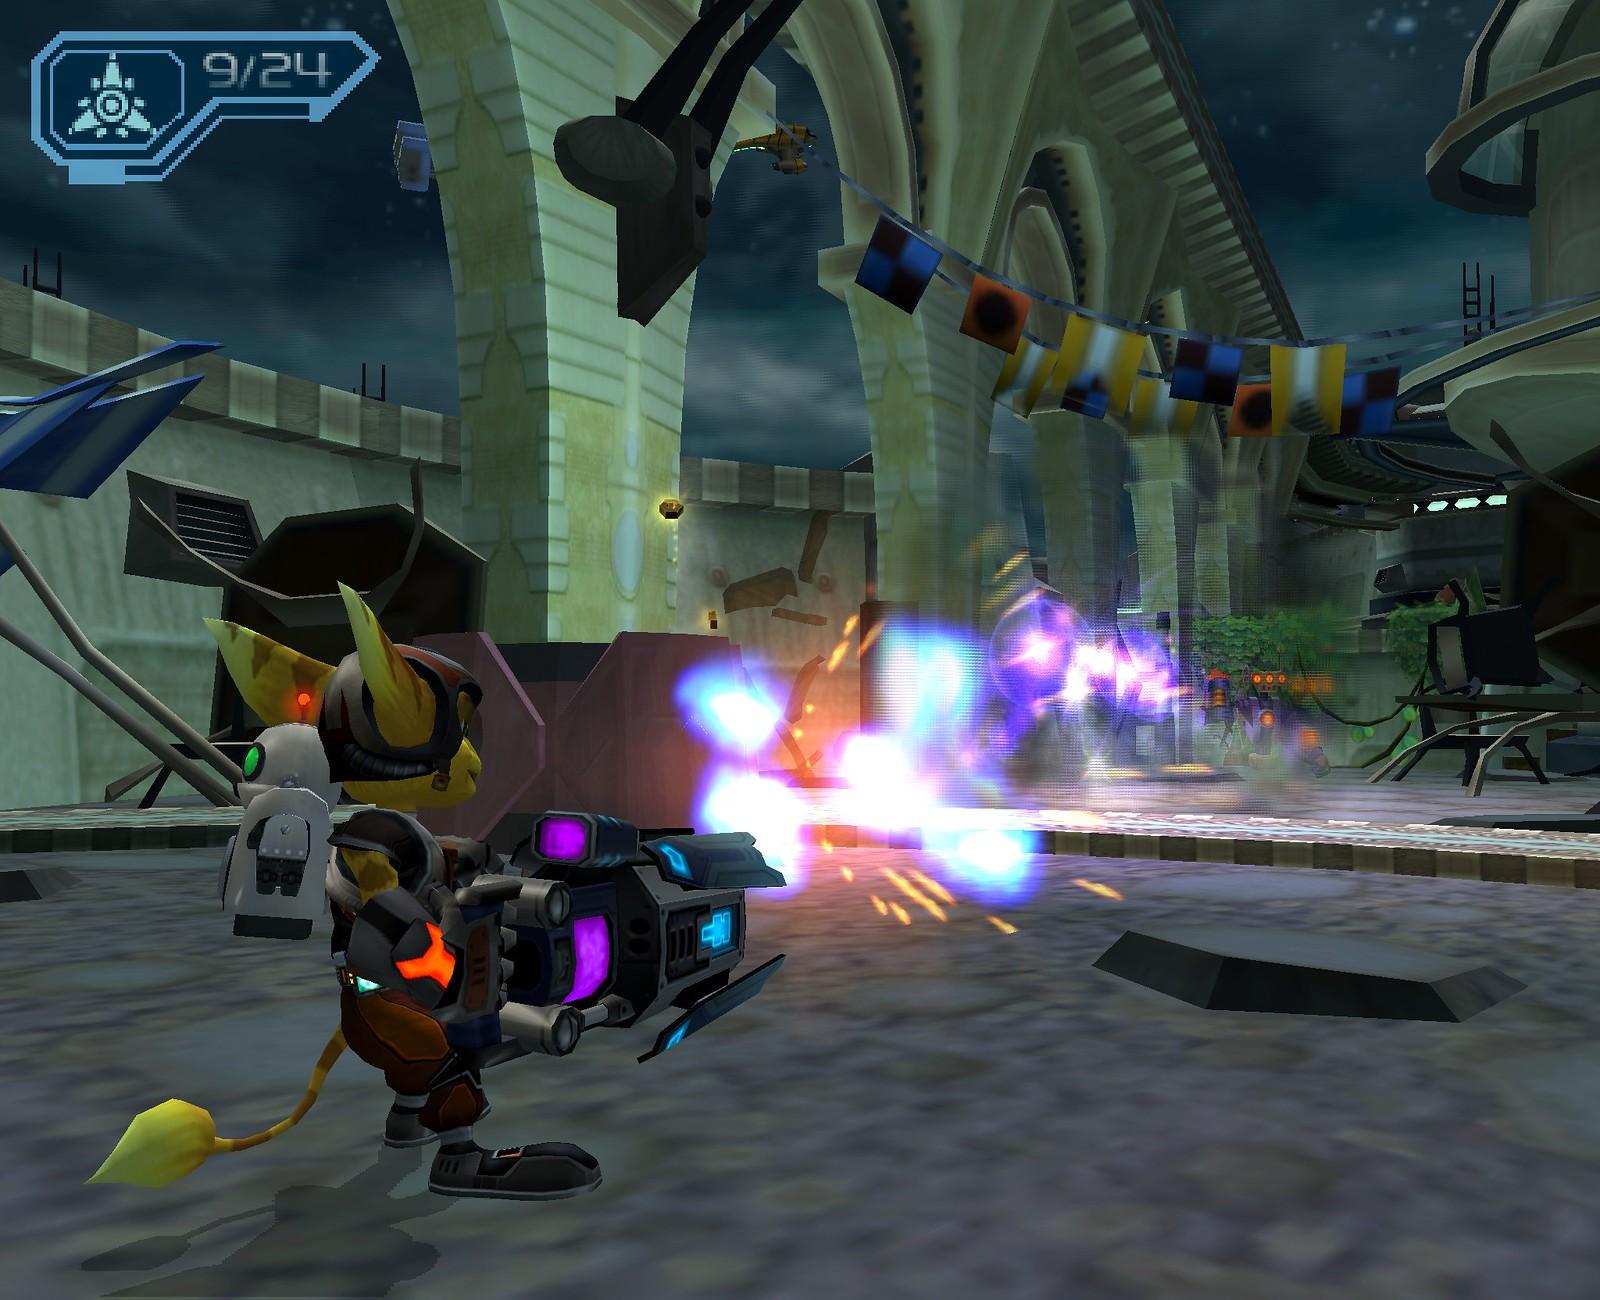 Ratchet & Clank - Franchise Evolution